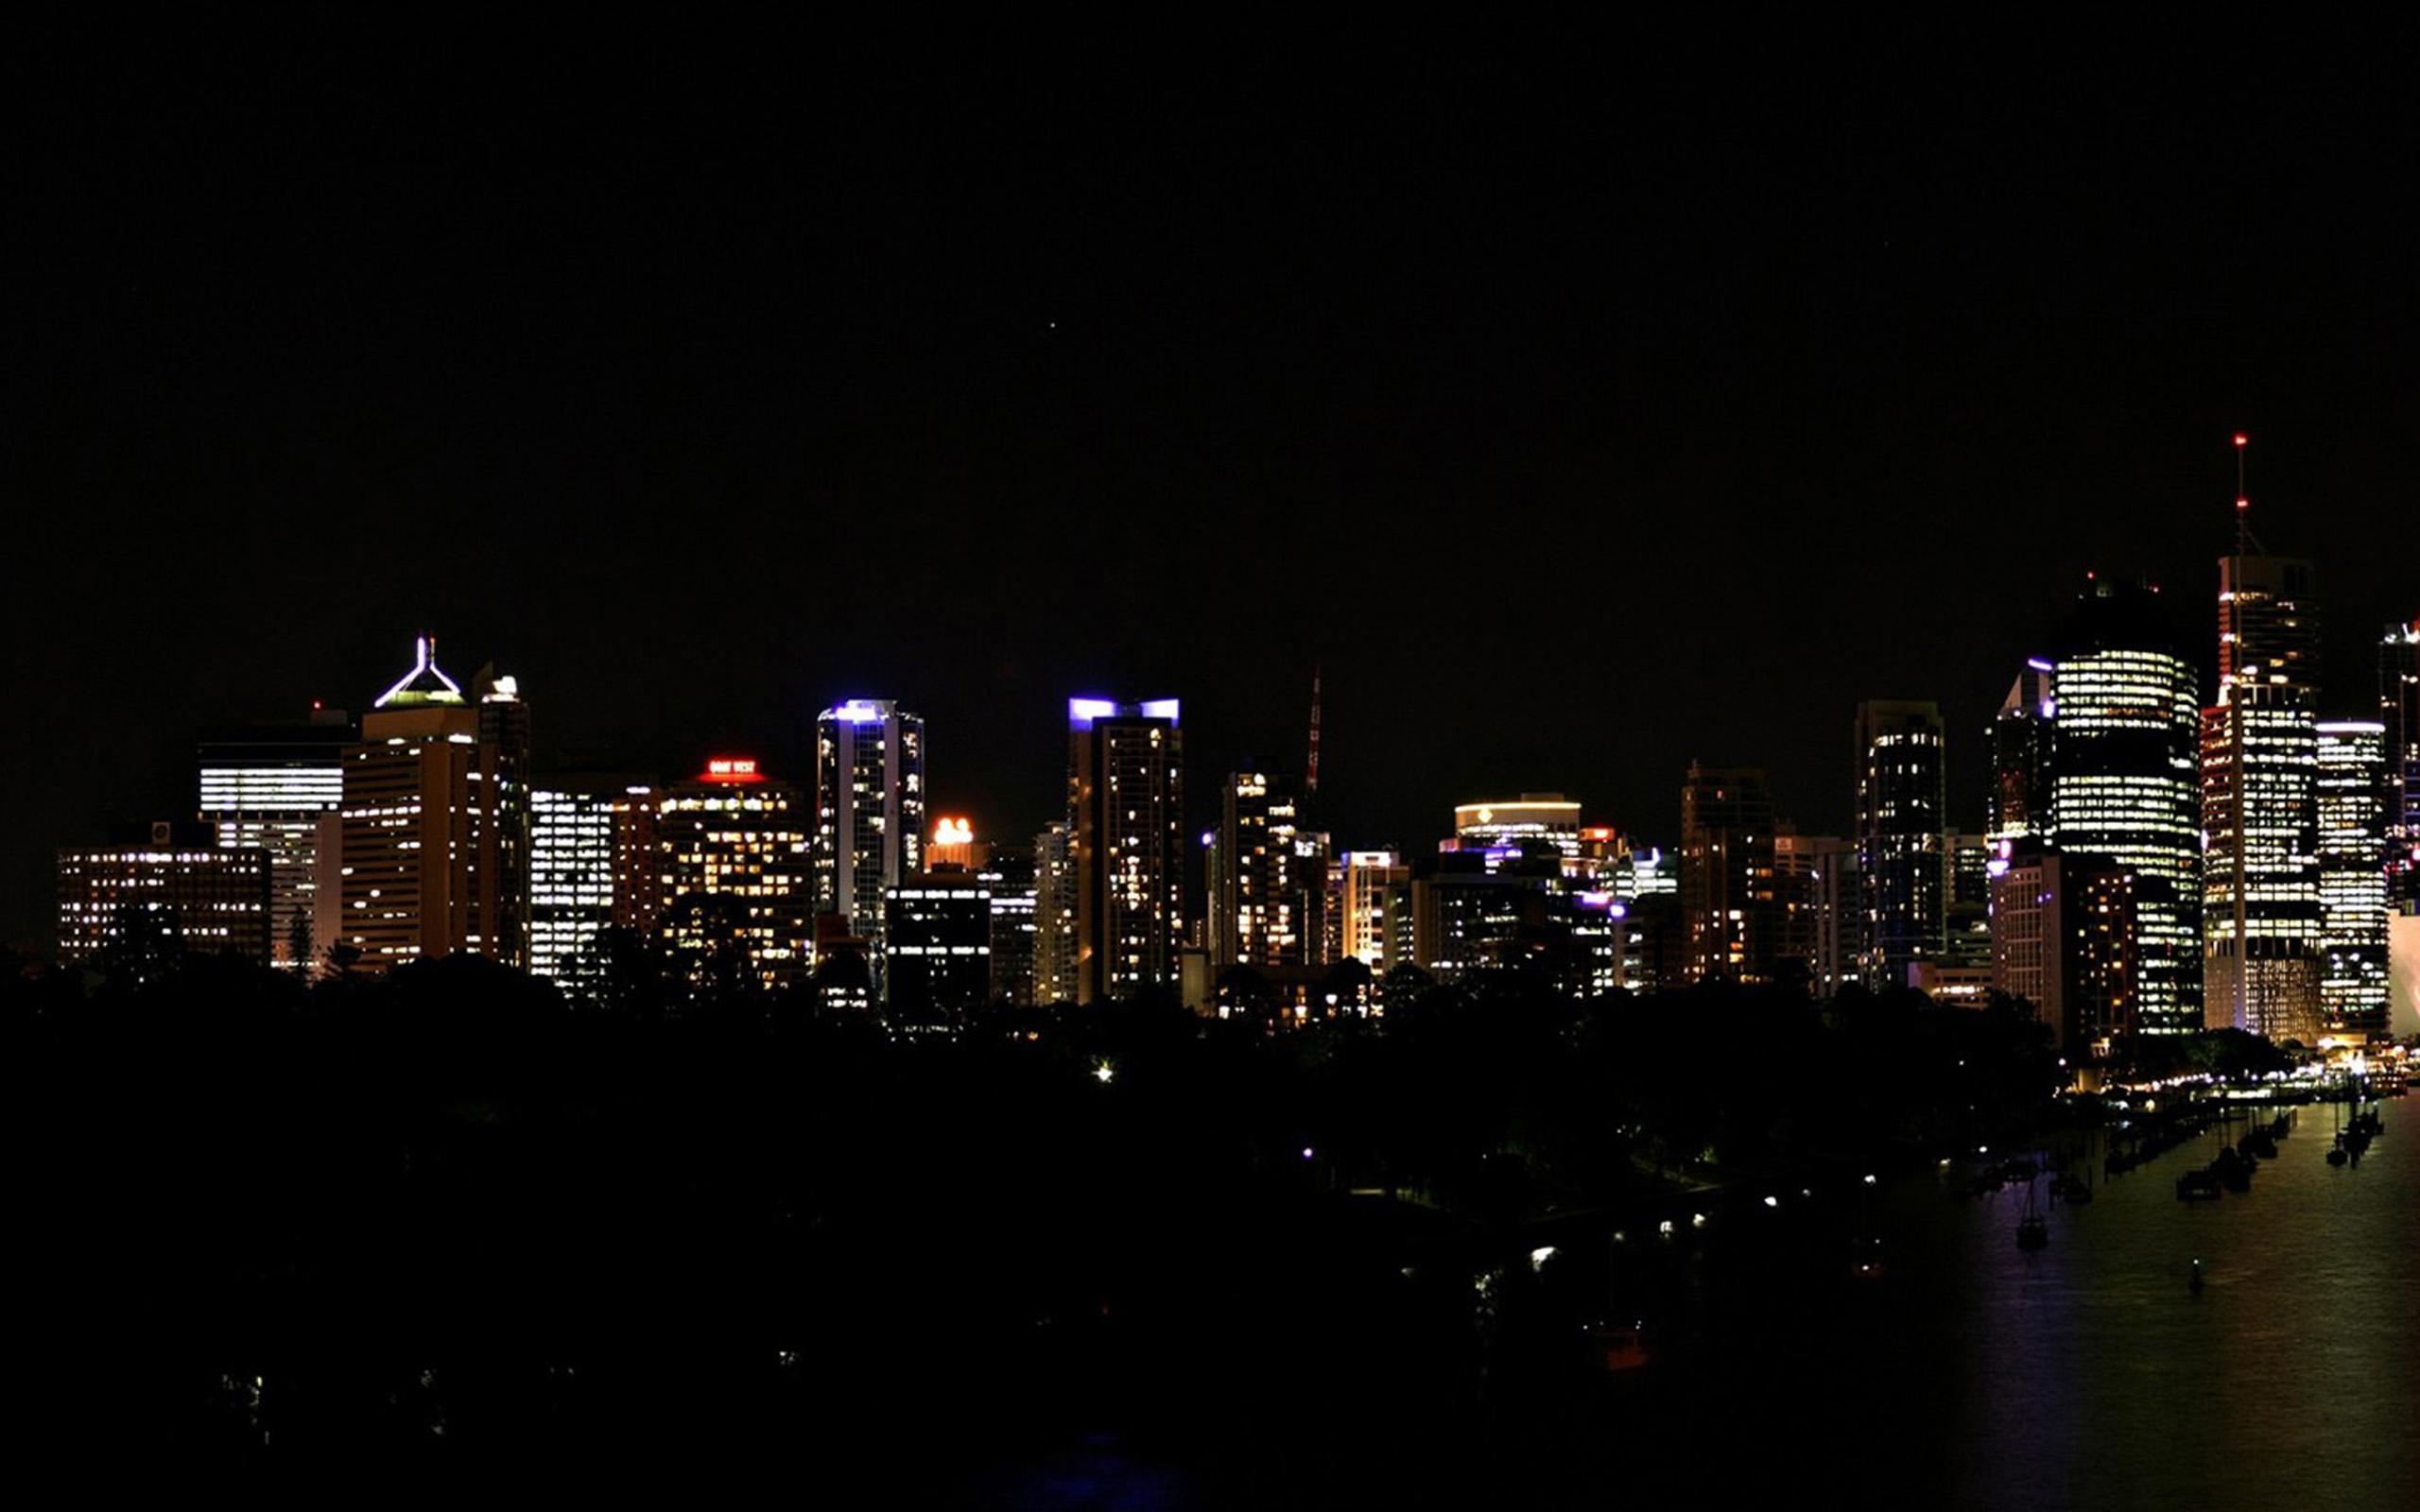 QXB684   Dark City Wallpapers Dark City HD Photos   36 2560x1600